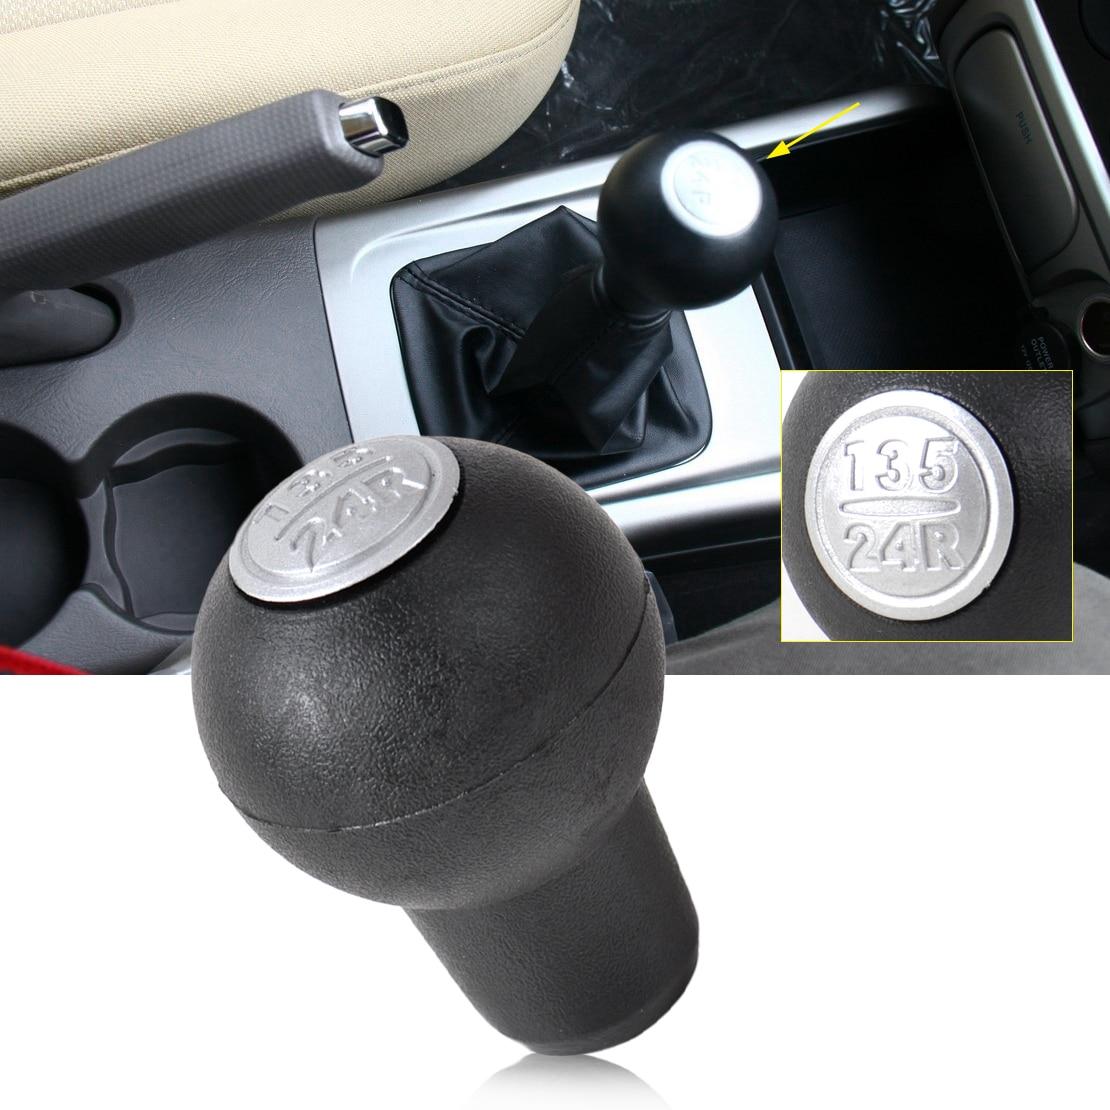 Beler 5-speed mt engrenagem vara shift knob para hyundai elantra/avante xd 2001 2002 2003 2004 2005 2006